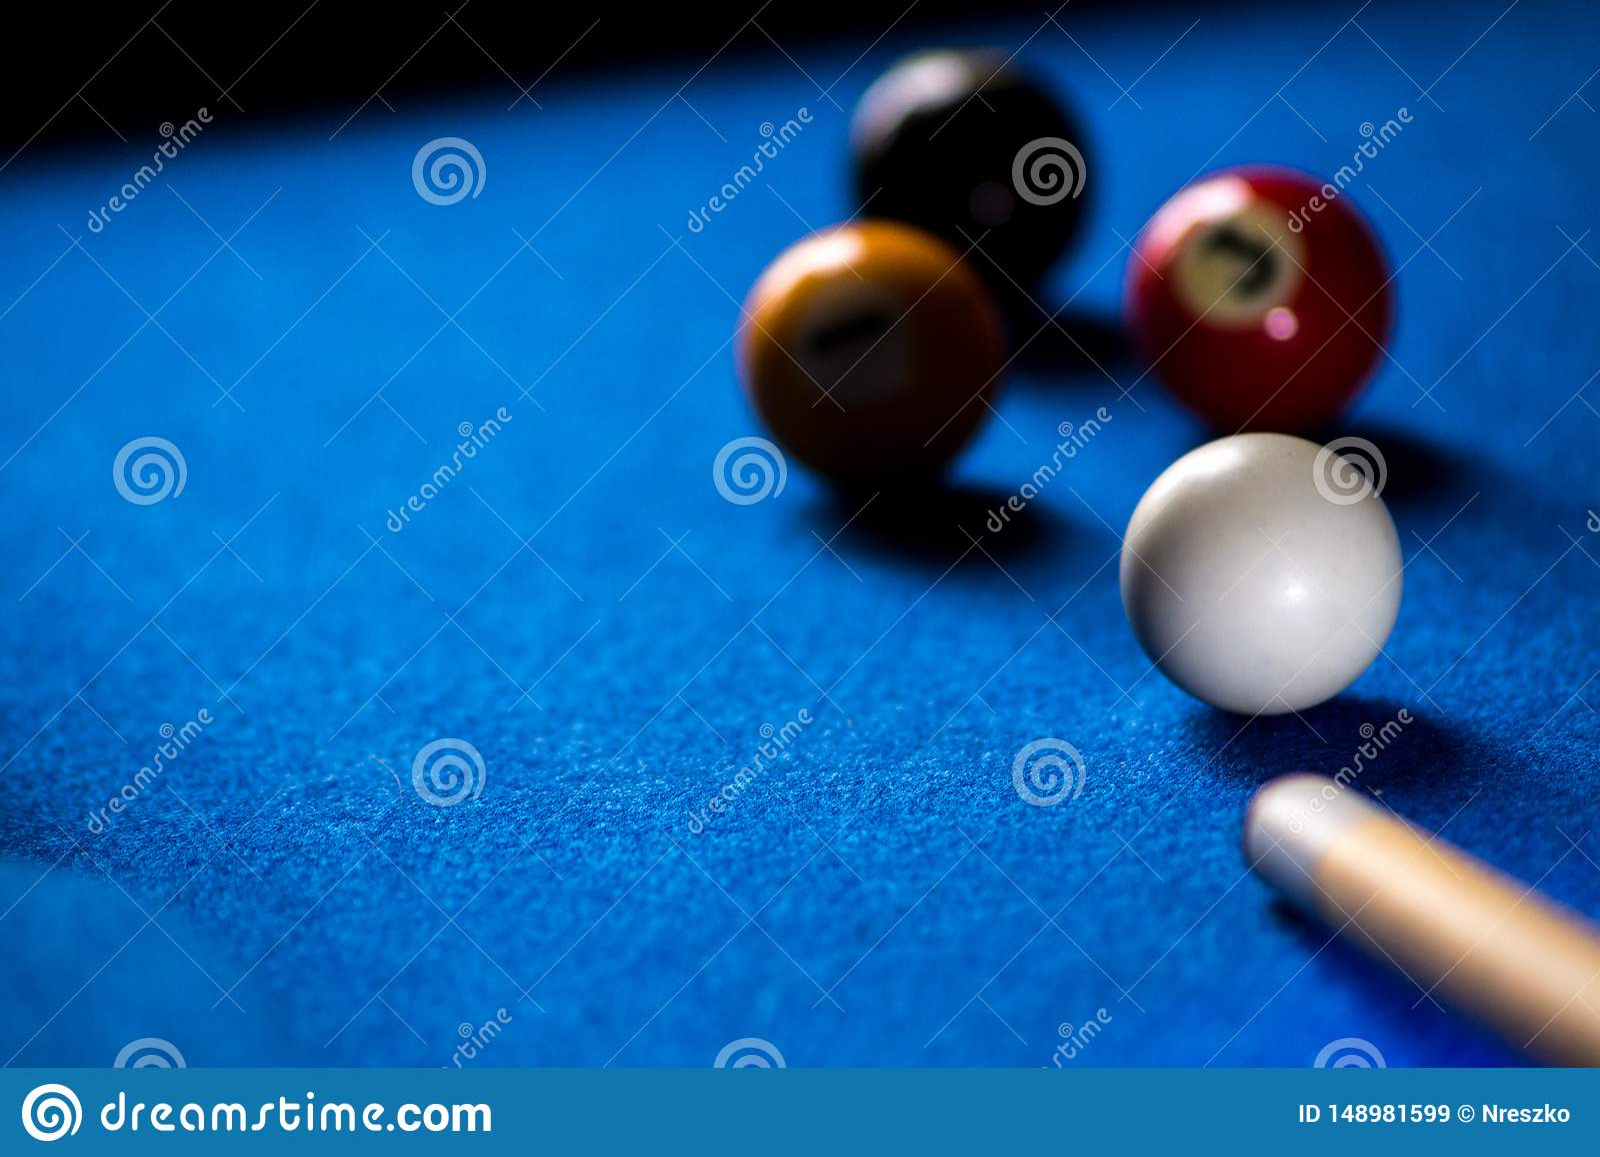 Pool billiard balls on blue table sport game set. Snooker, pool game